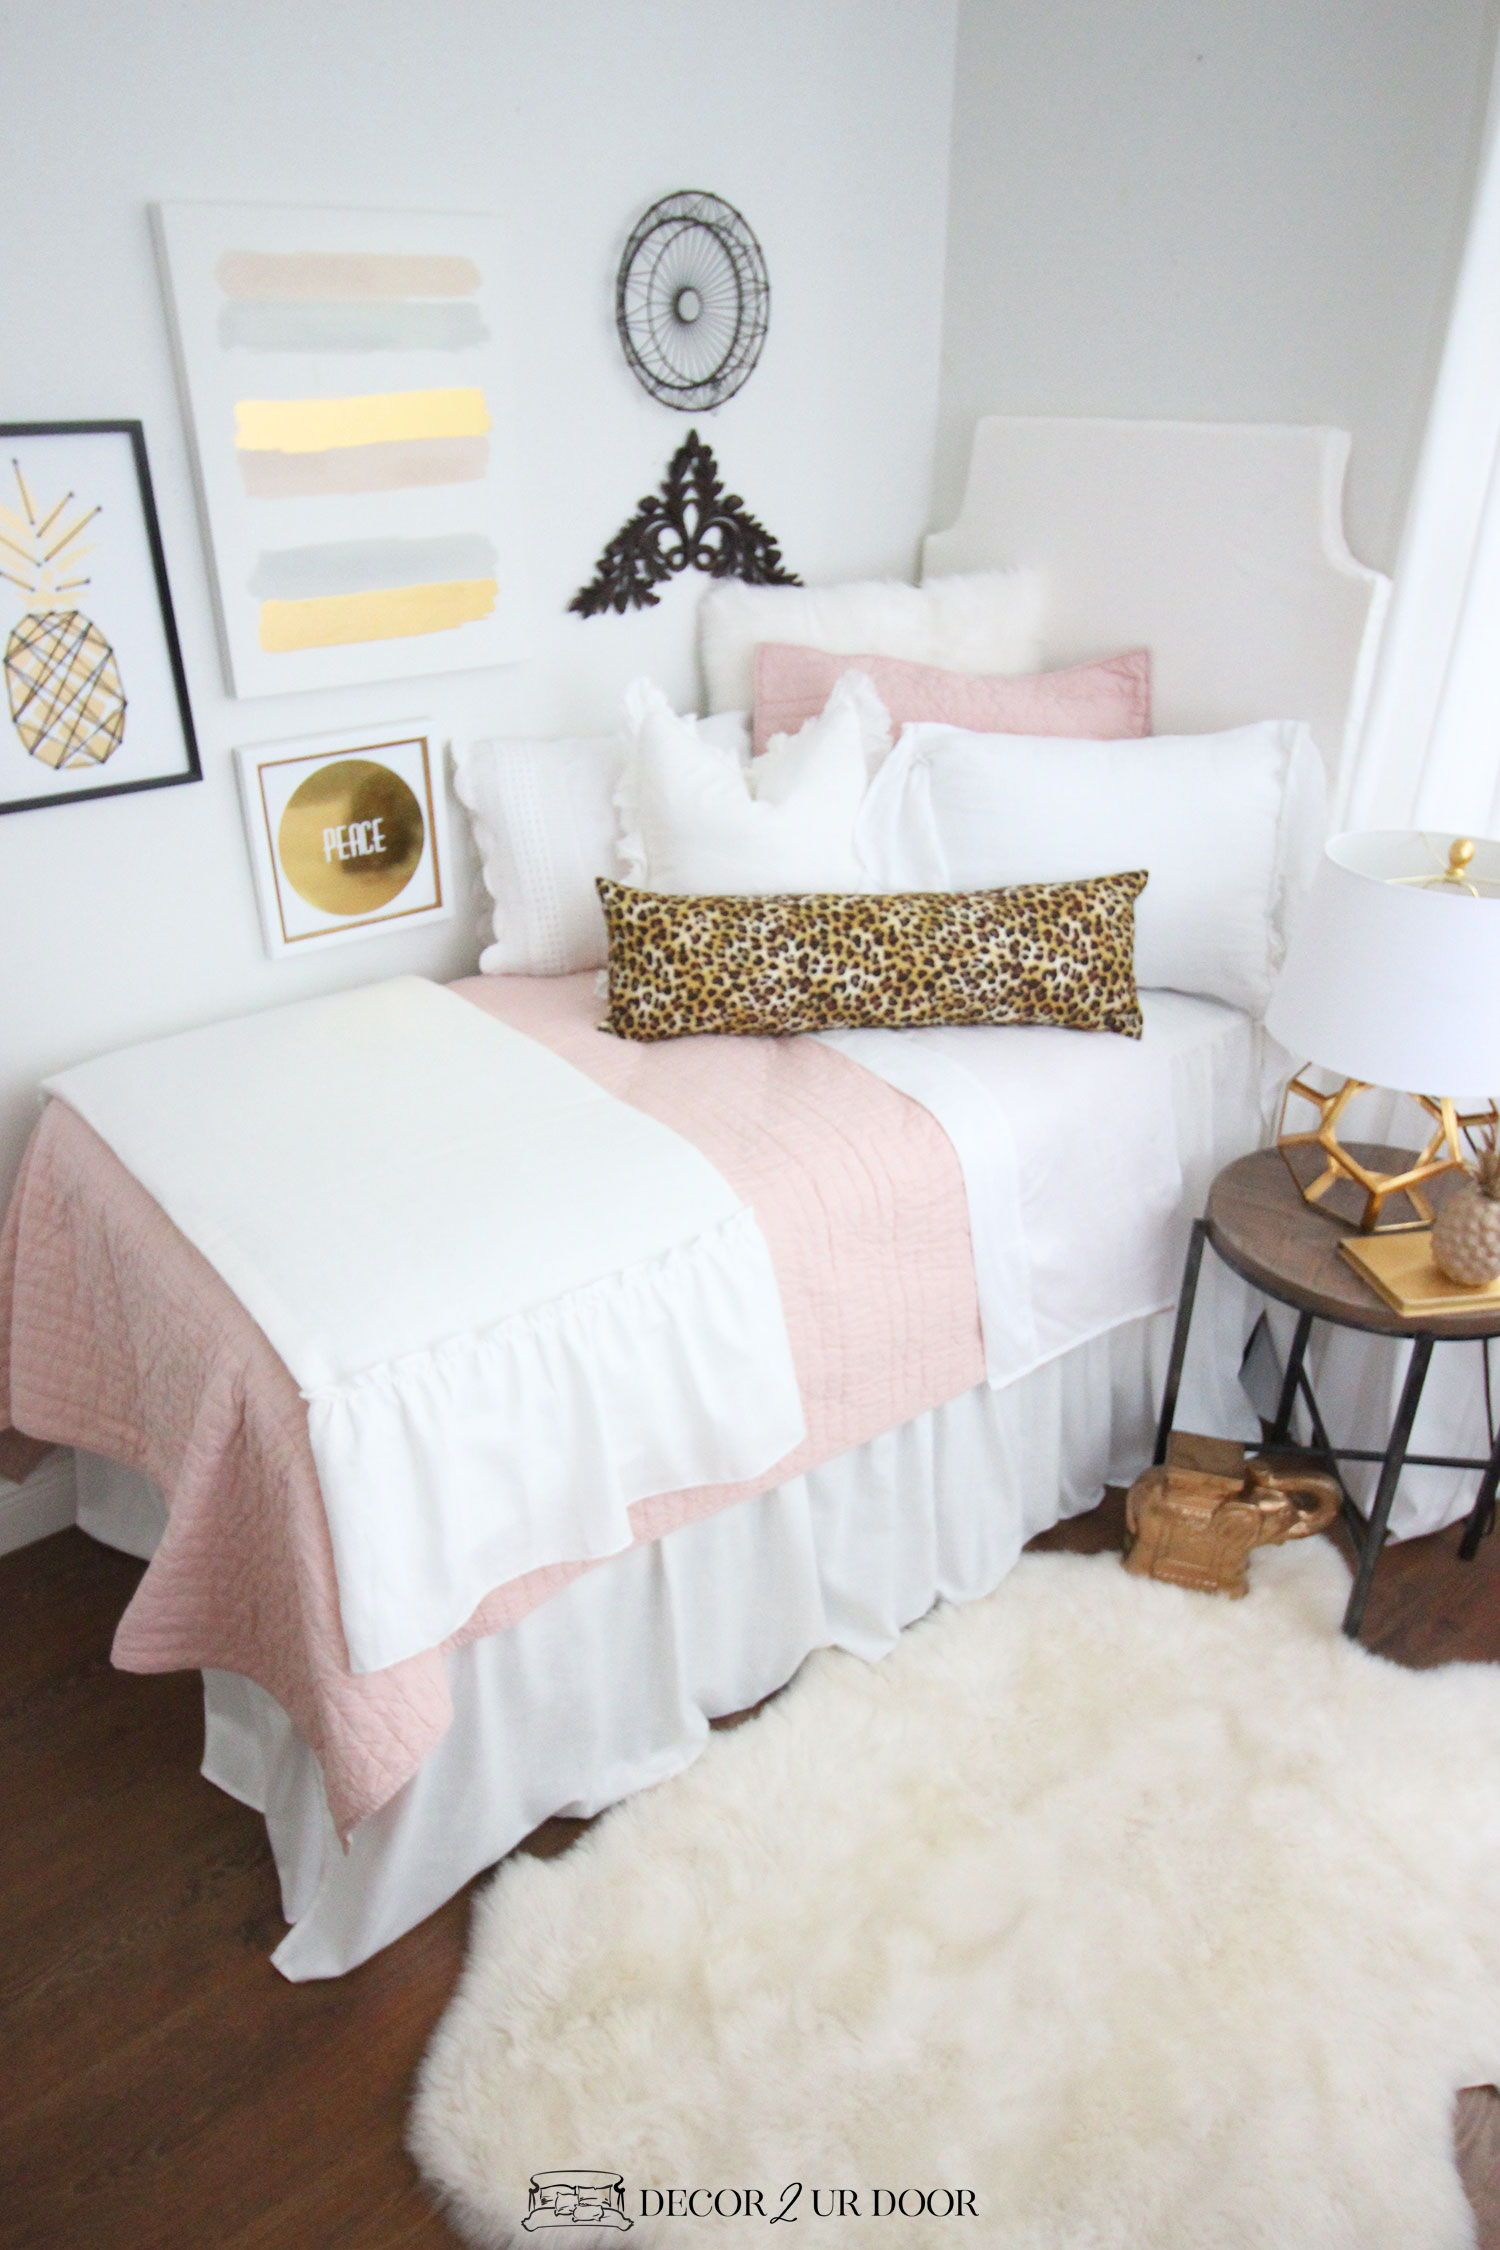 Blush Pink Dorm Room Ideas and Inspiration  Dorm bedding sets